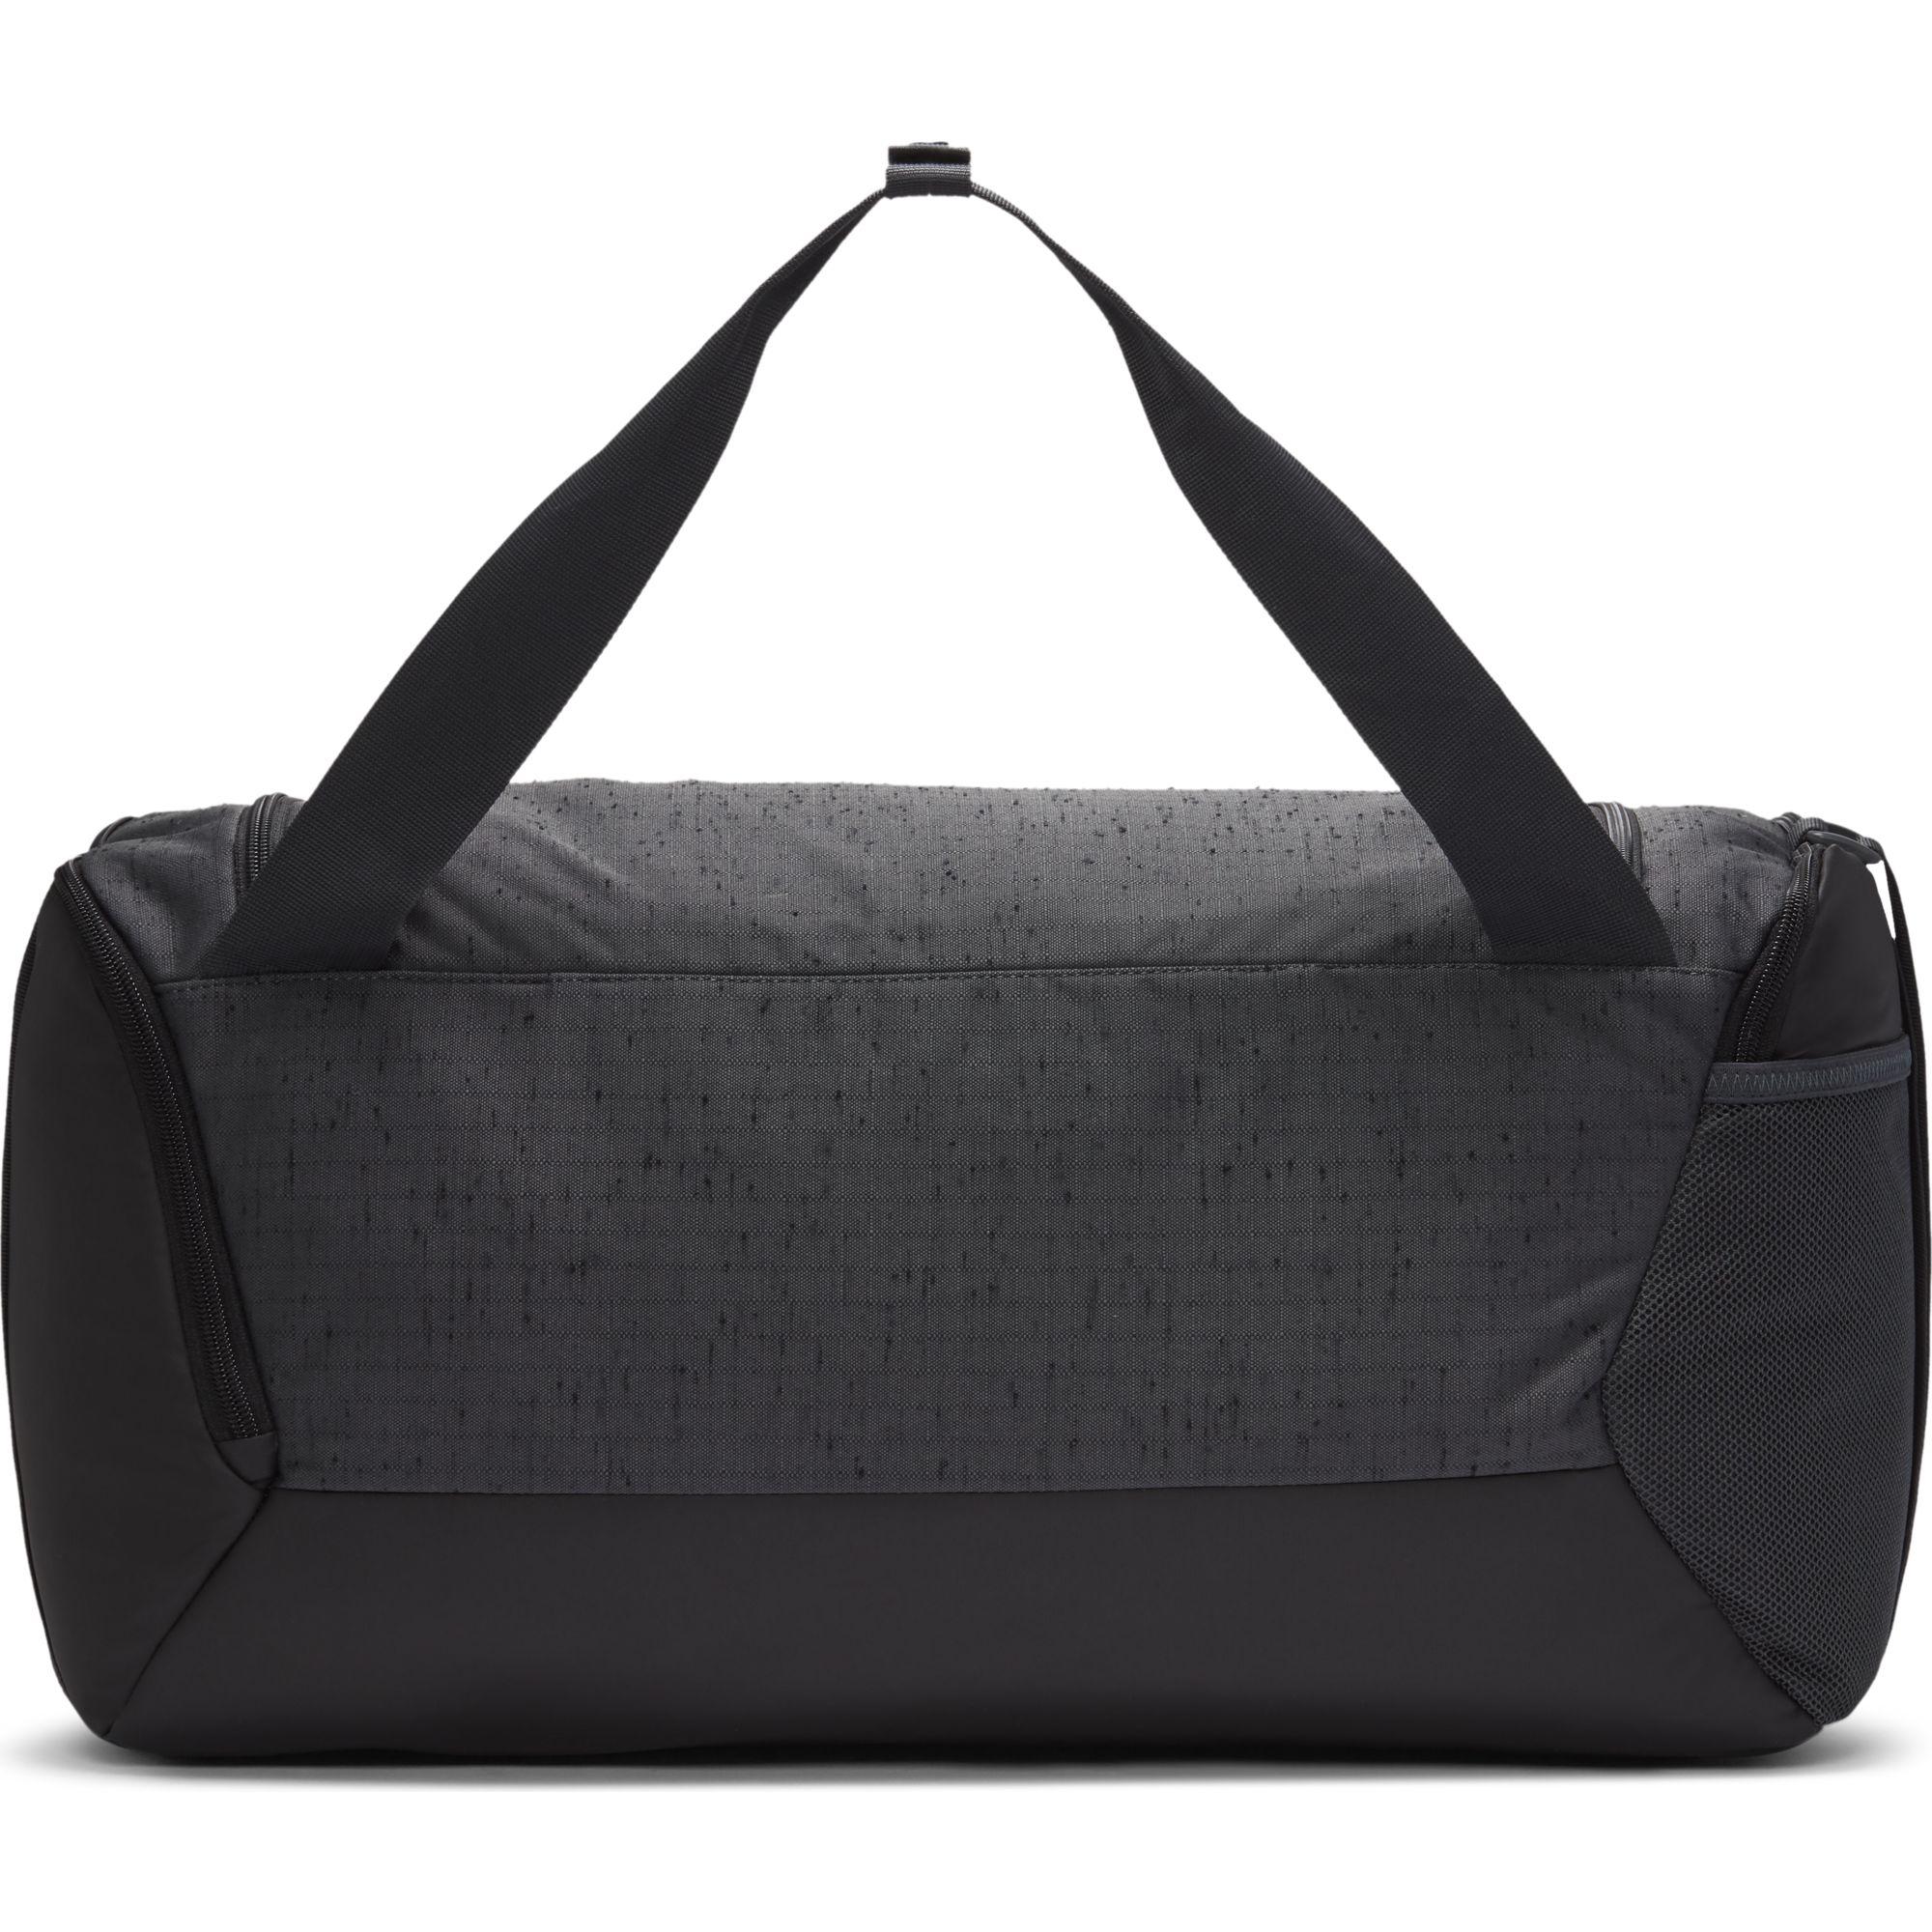 Brasilia Small Training Duffell Bag, Charcoal/Blue, swatch